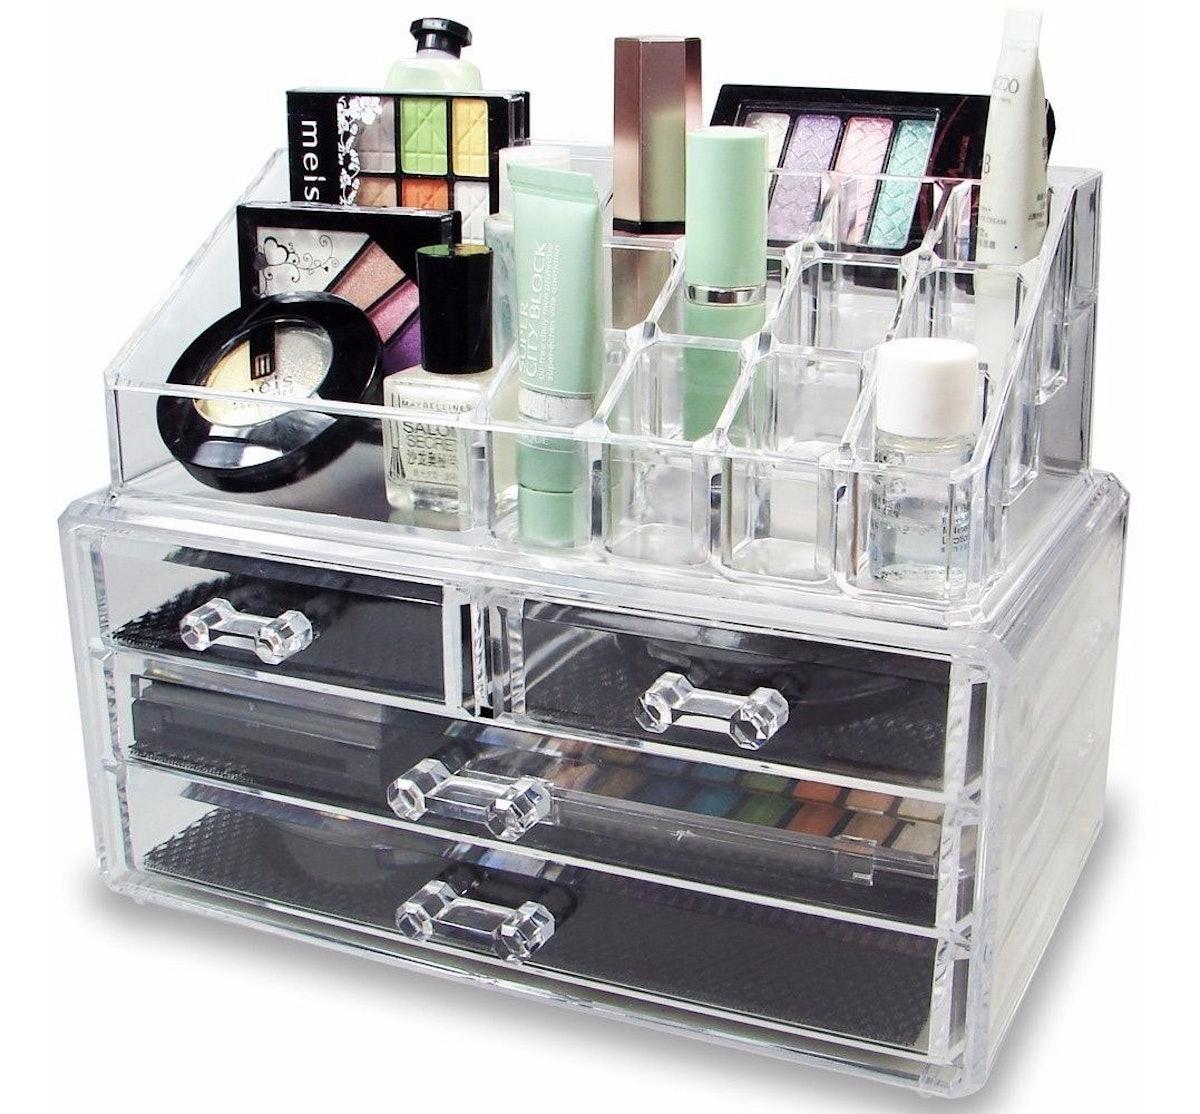 Ikee Design Jewelry and Cosmetics Organizer